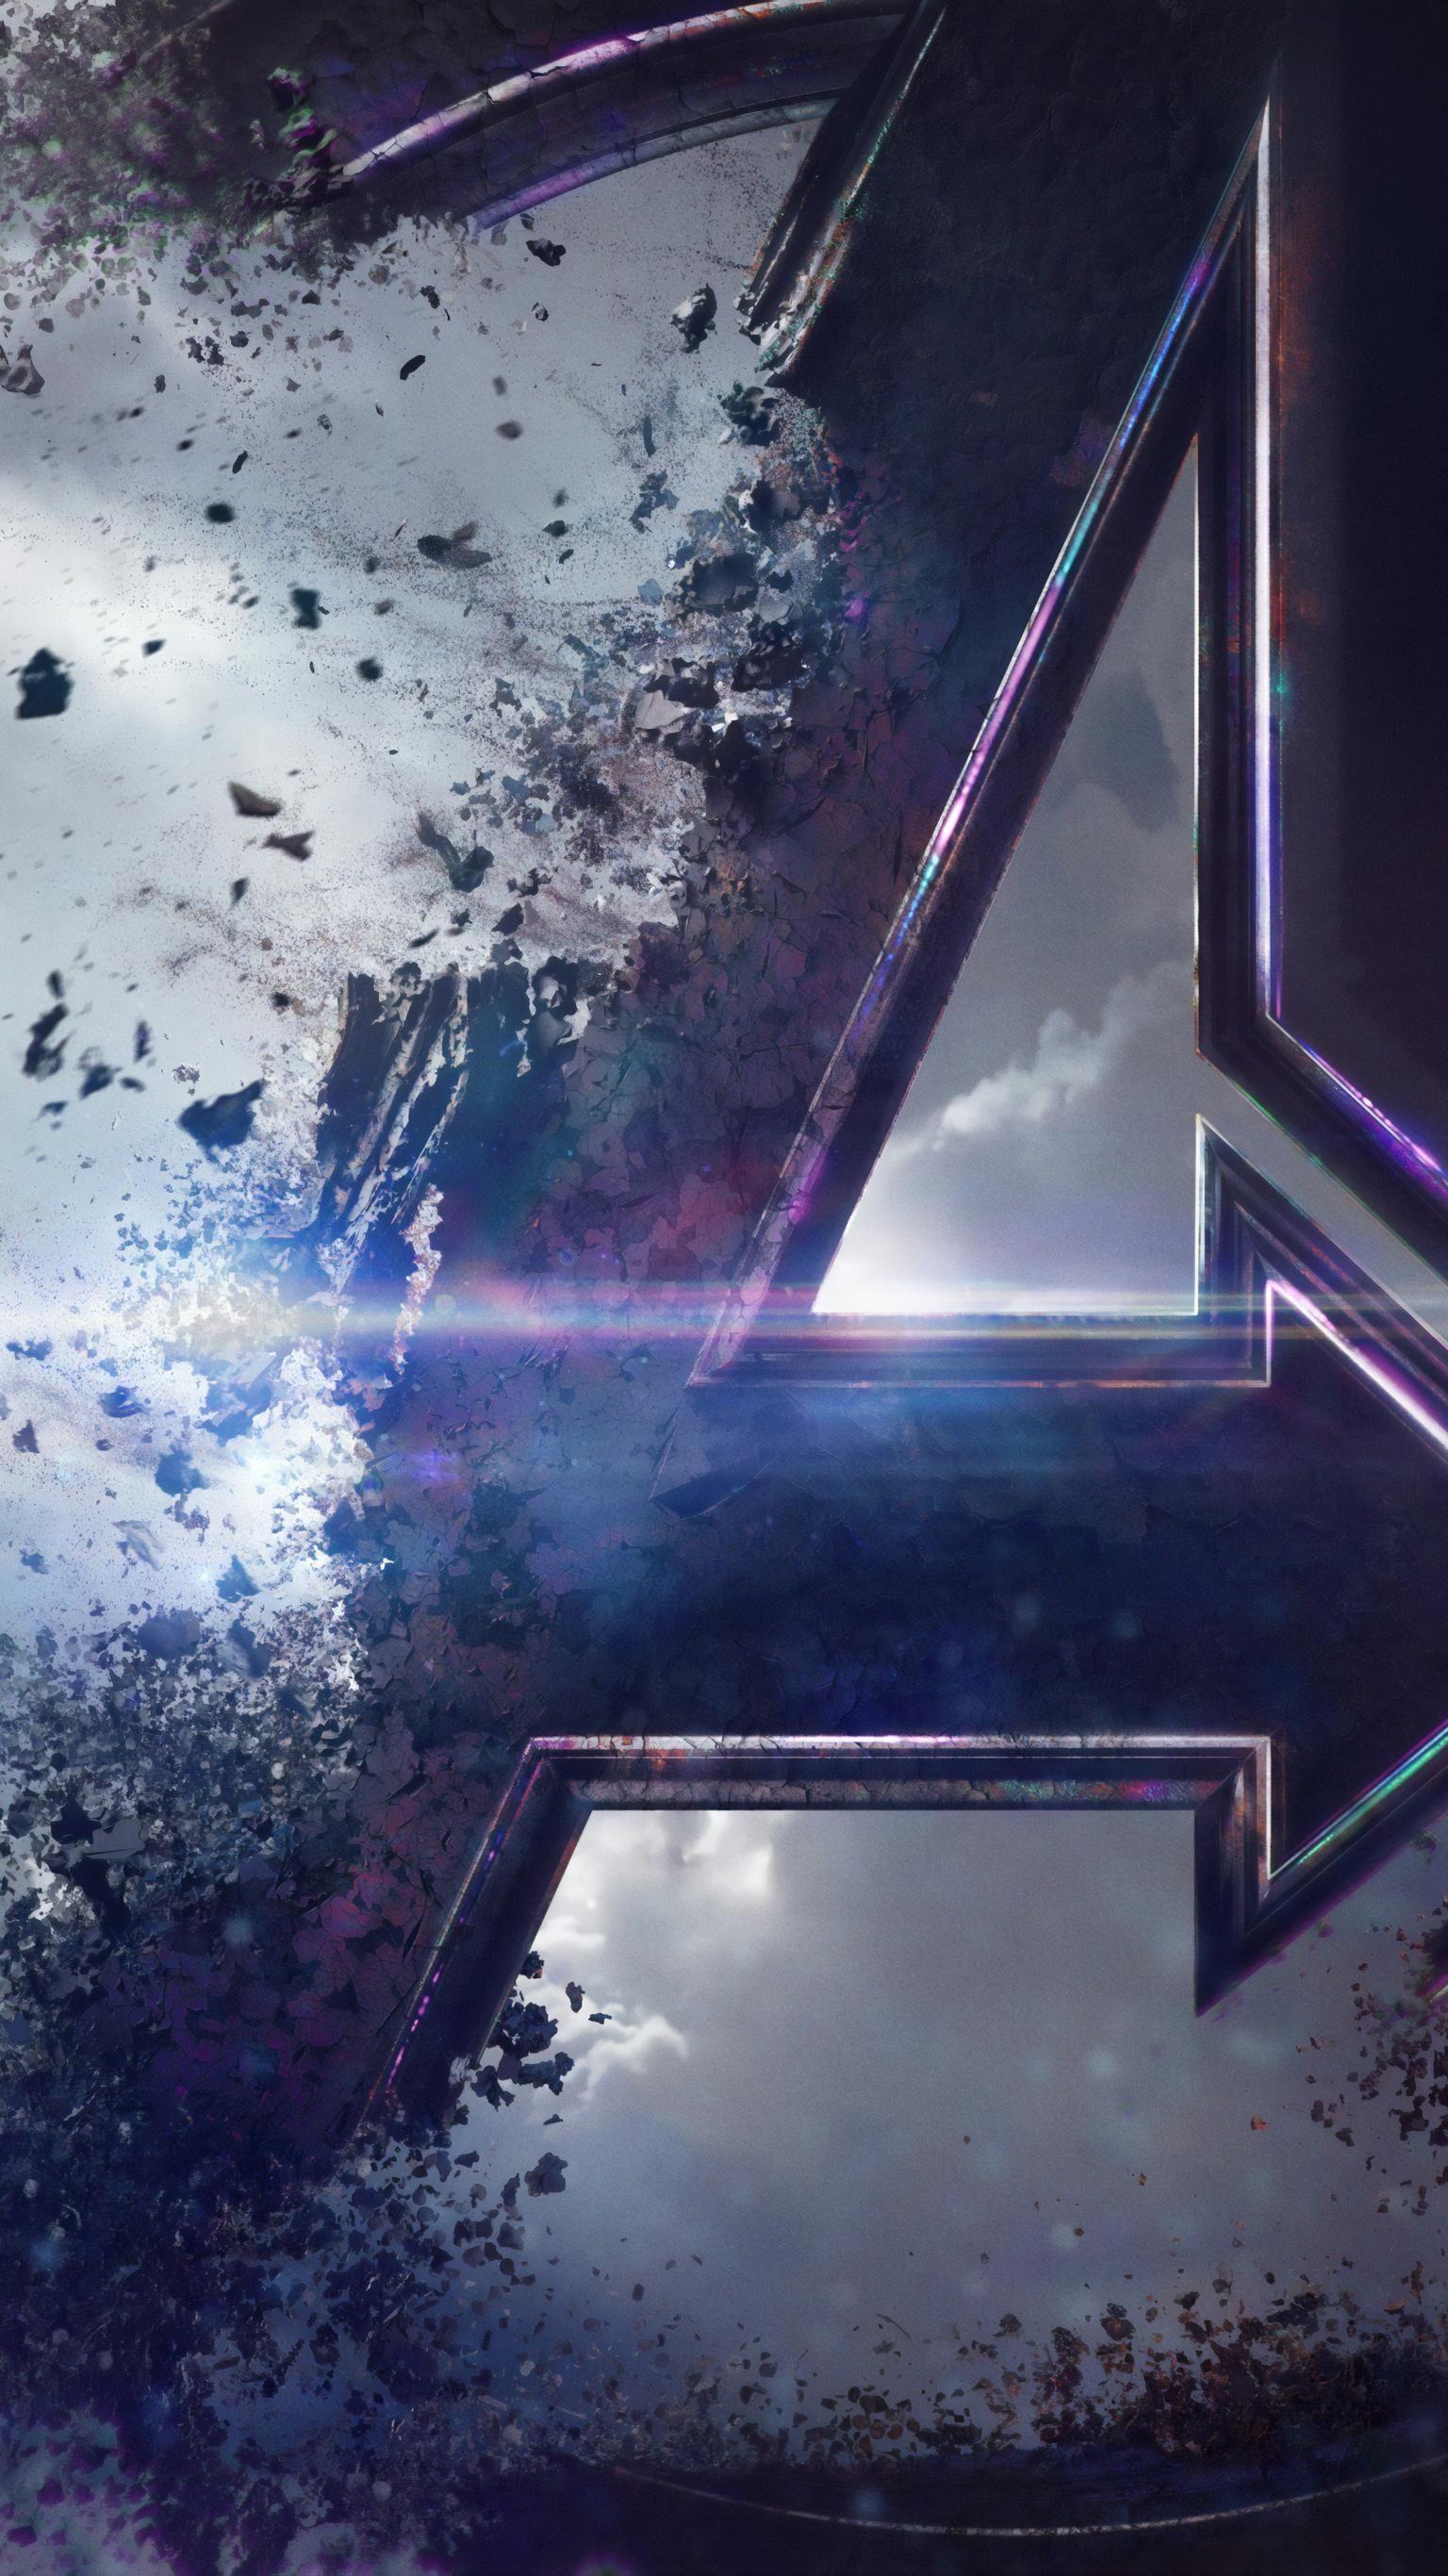 Avengers Endgame 2019 Phone Wallpaper Moviemania Marvel Wallpaper Avengers Wallpaper Marvel